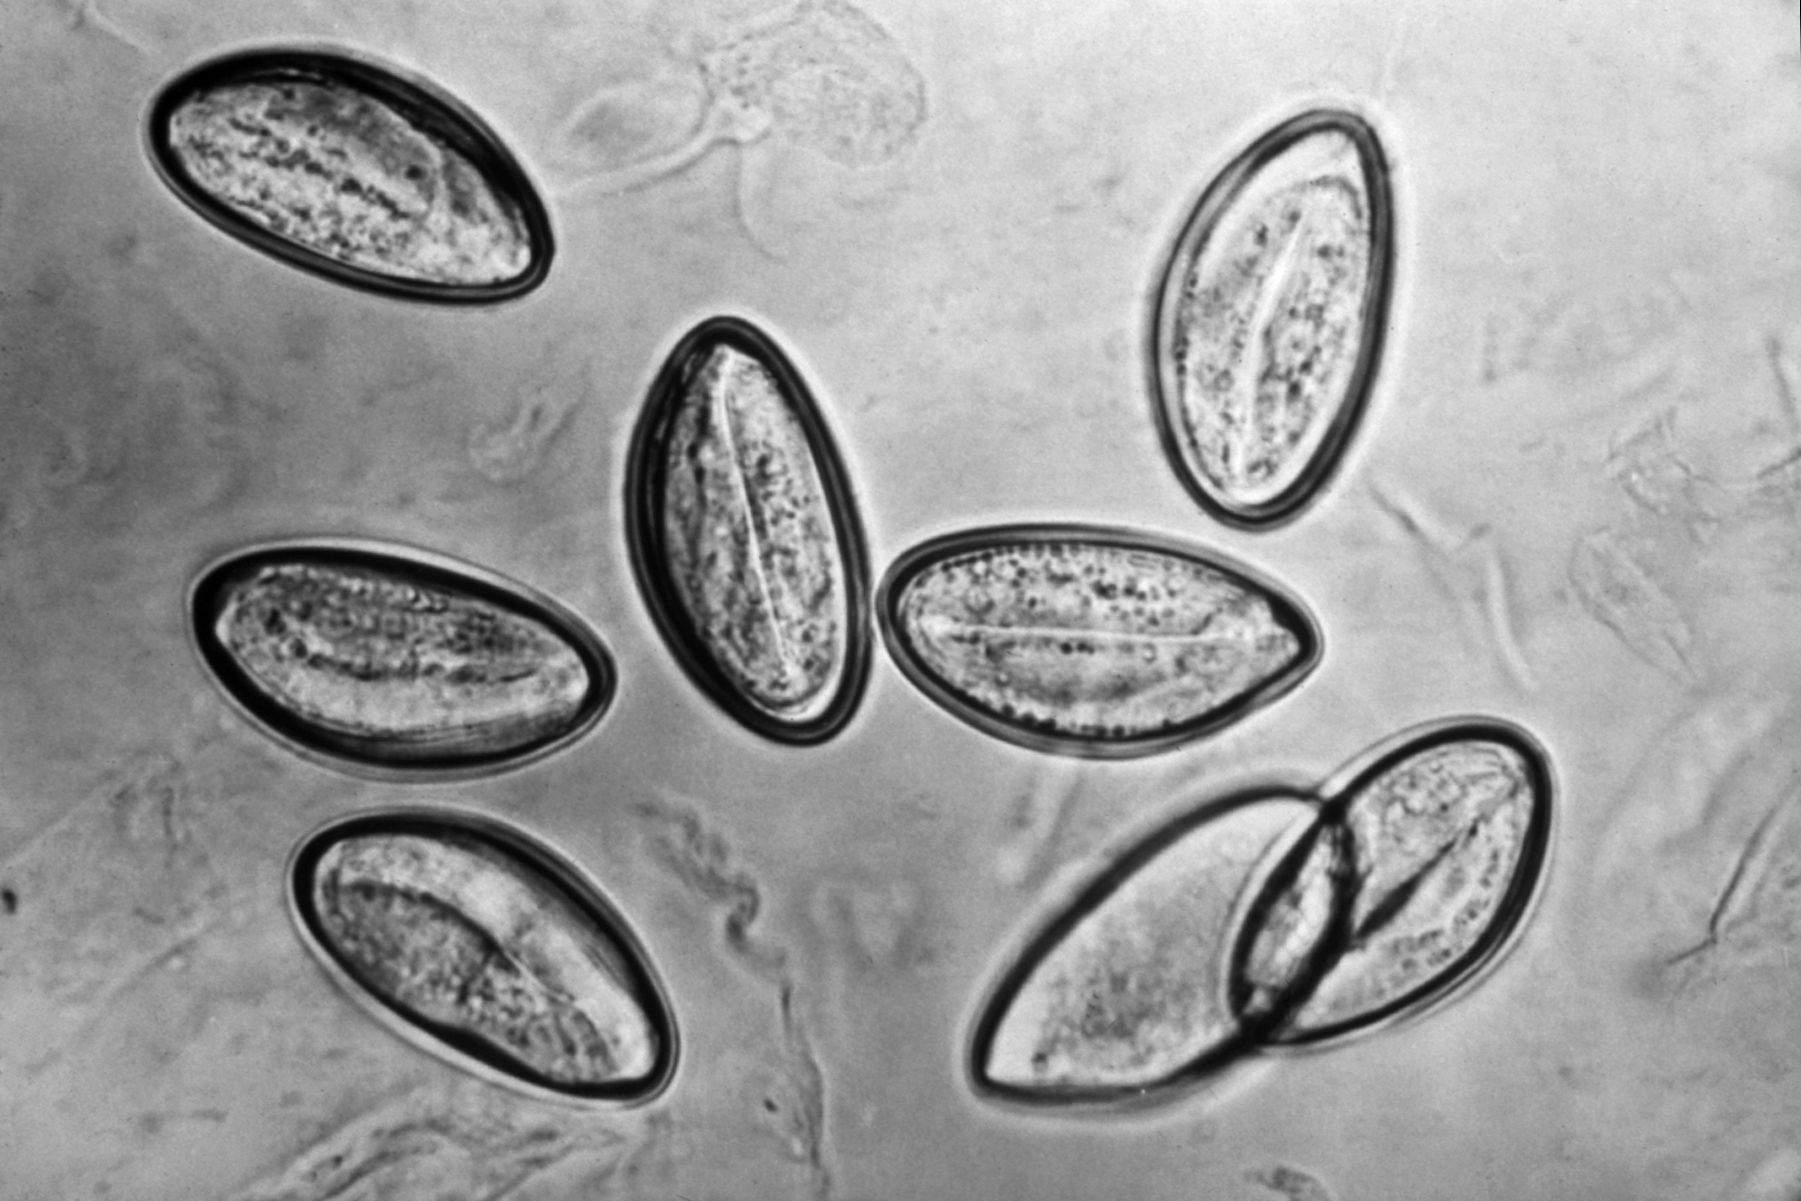 Enterobius vermicularis causes what disease - Ascaris in Giardia tablete